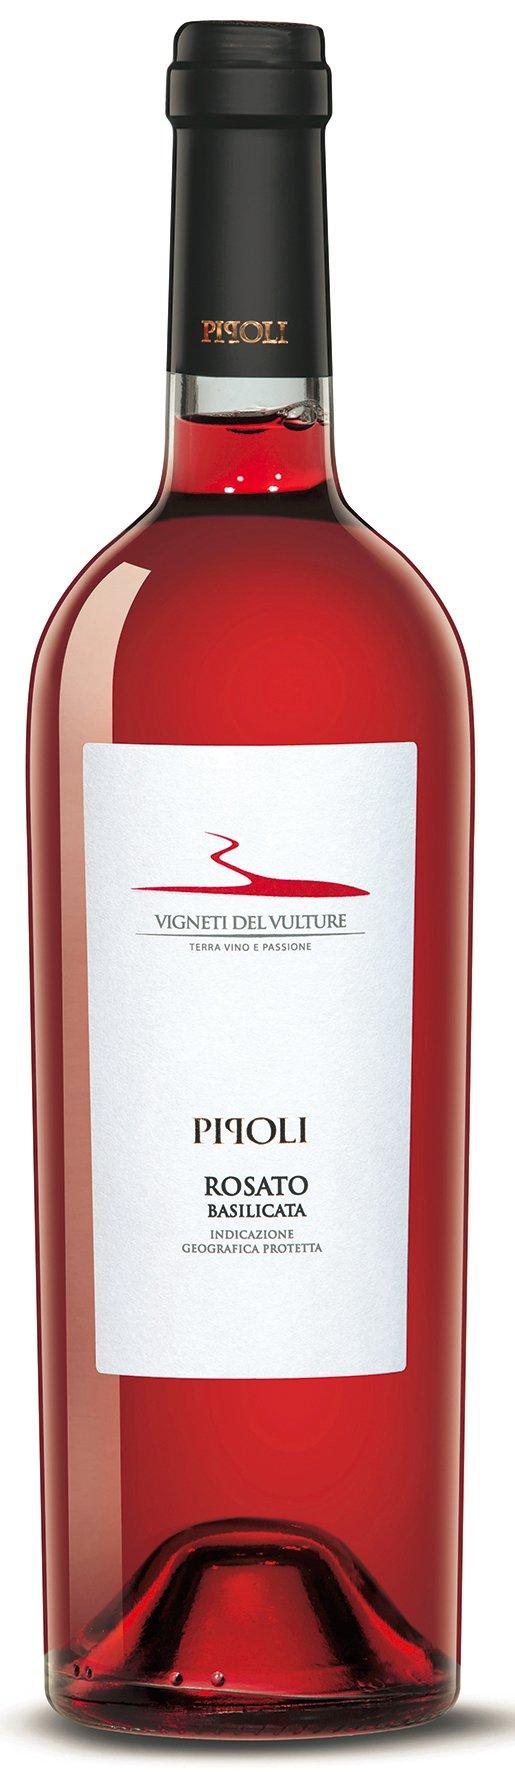 6x-075l-2018er-Vigneti-del-Vulture-Pipoli-Rosato-Basilicata-IGP-Italien-Ros-Wein-trocken